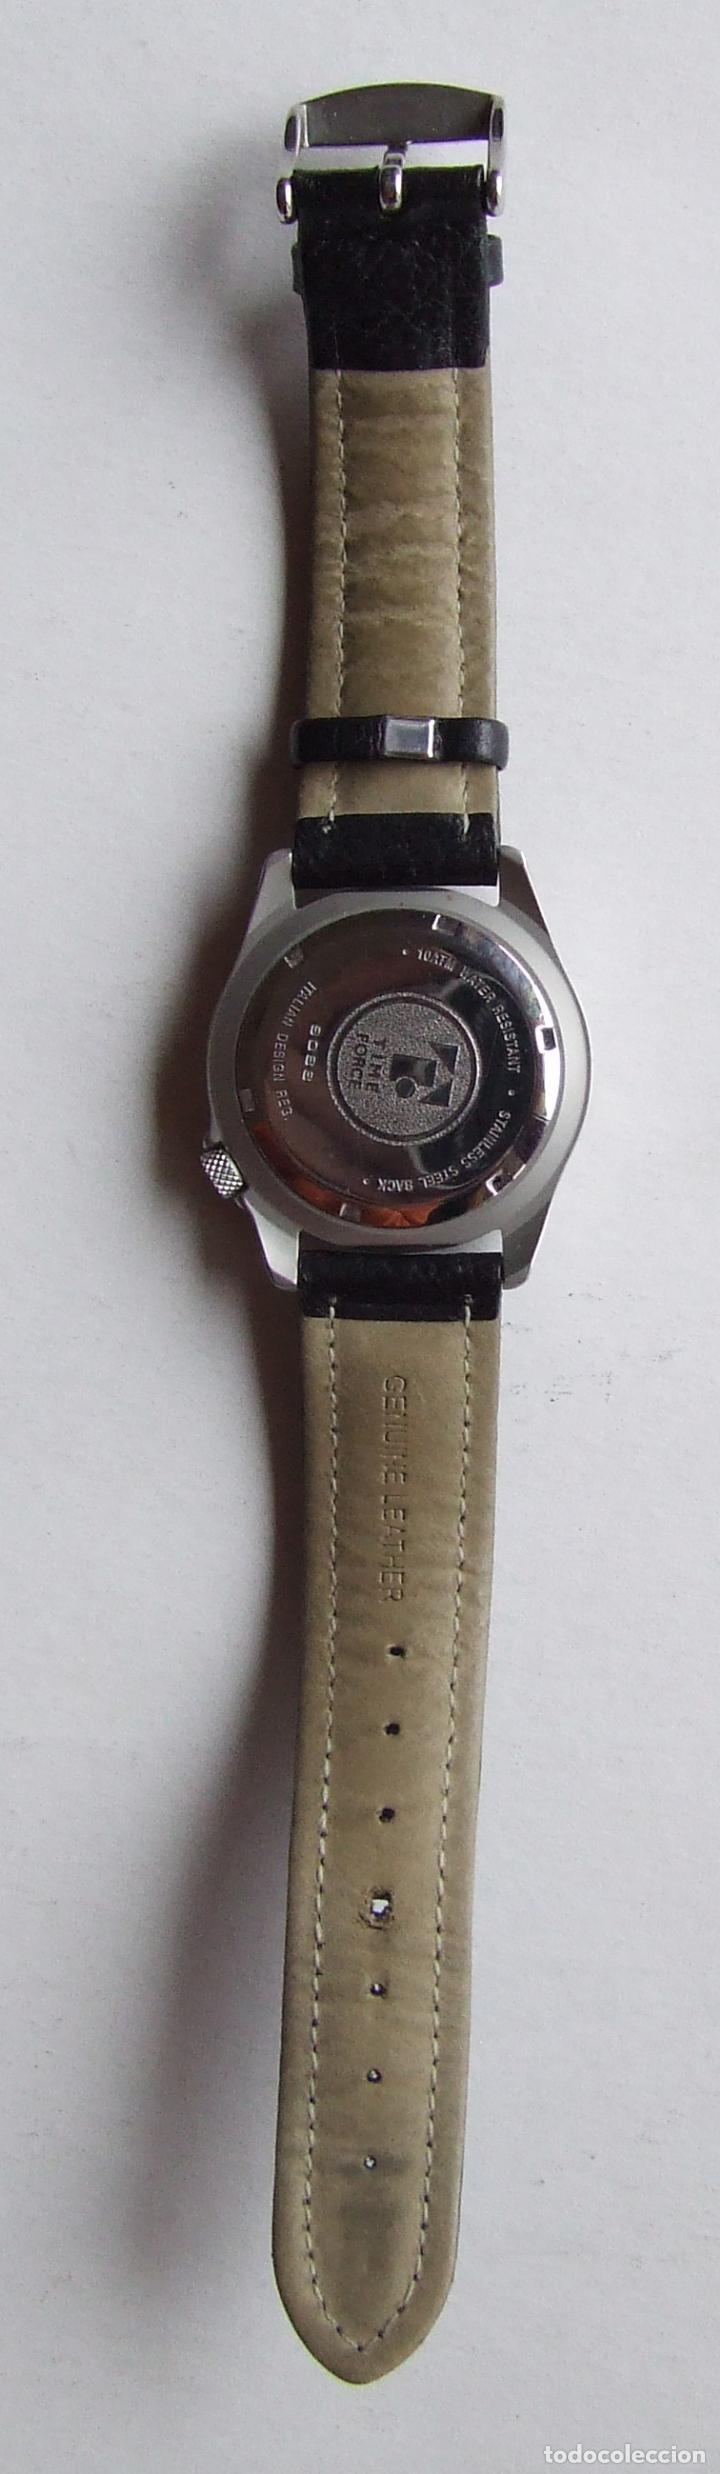 Relojes automáticos: RELOJ DE PULSERA TIME FORCE 100 M CON CALENDARIO - Foto 3 - 105821947